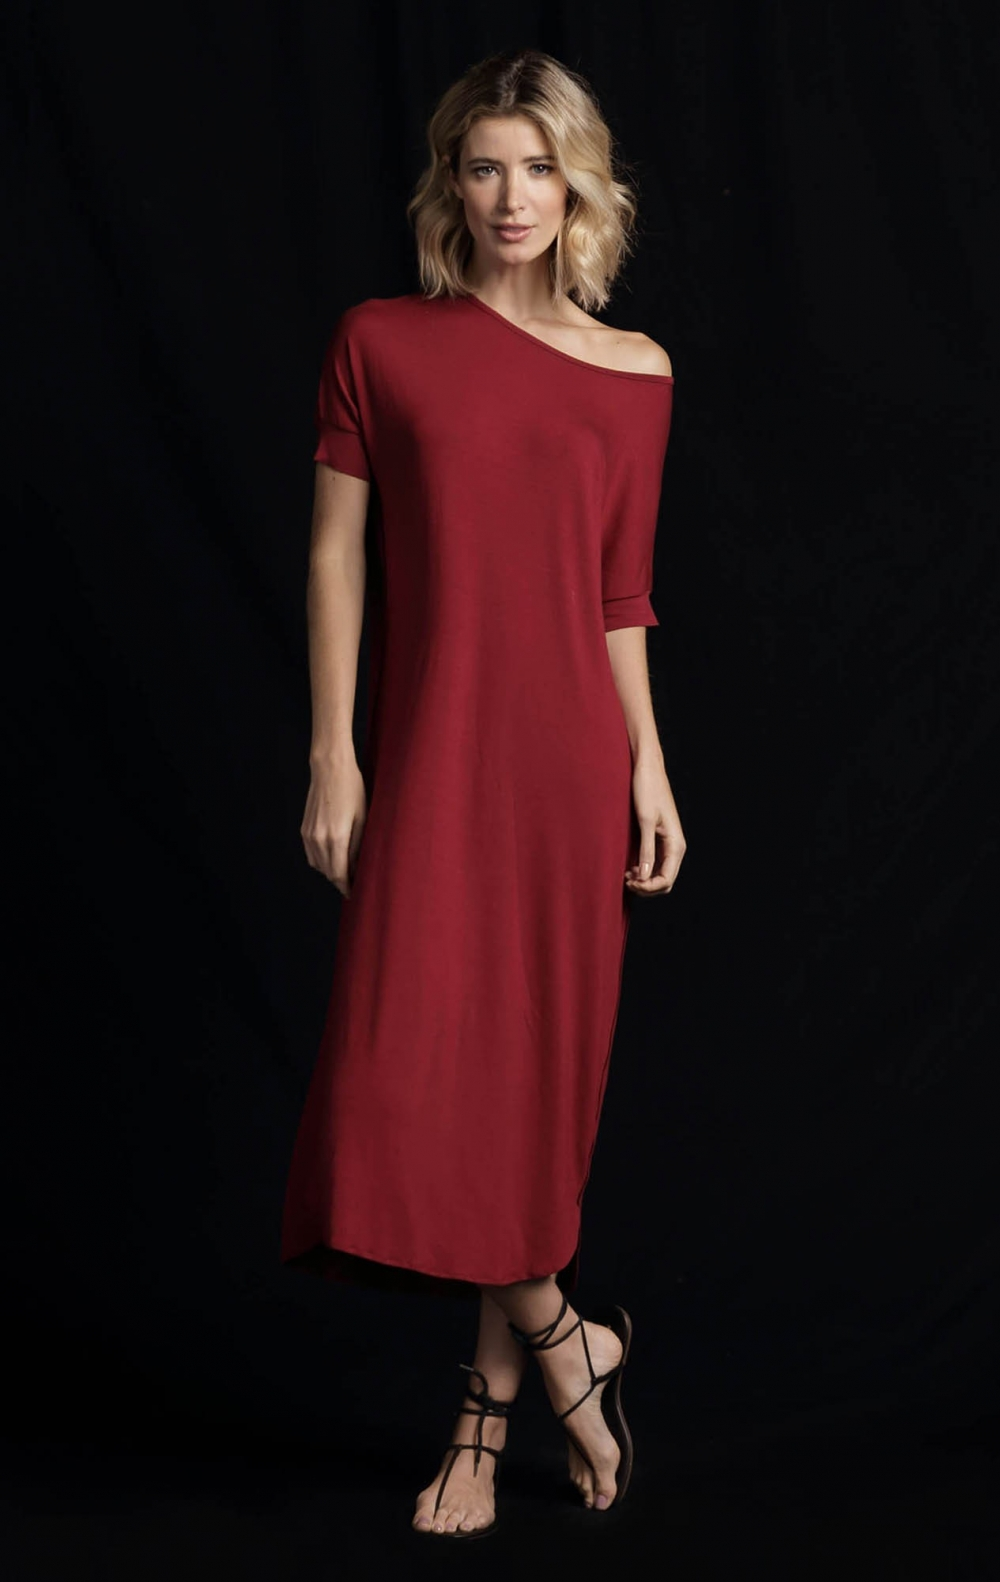 Vestido Malha Tunica Vinho - Foto 1